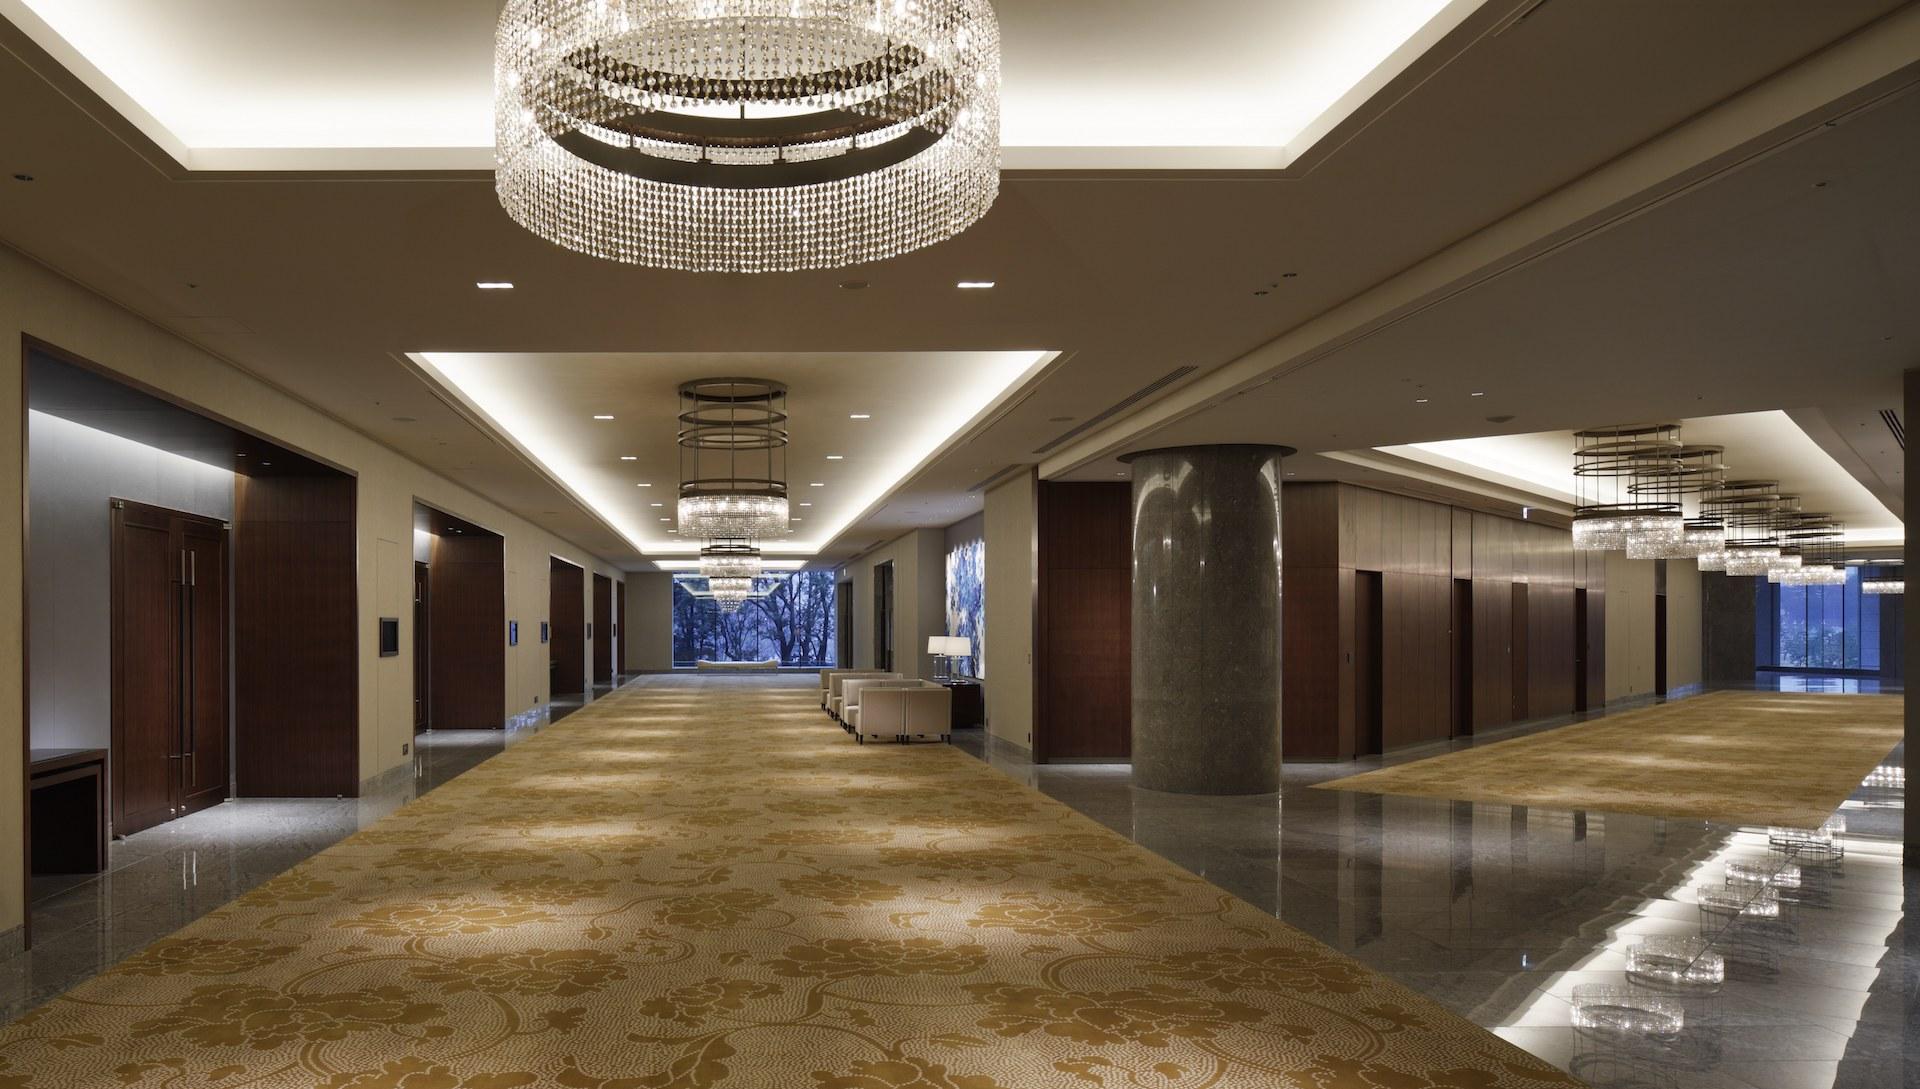 Foyer Hotel : Palace hotel tokyo aoi ballroom foyer f2